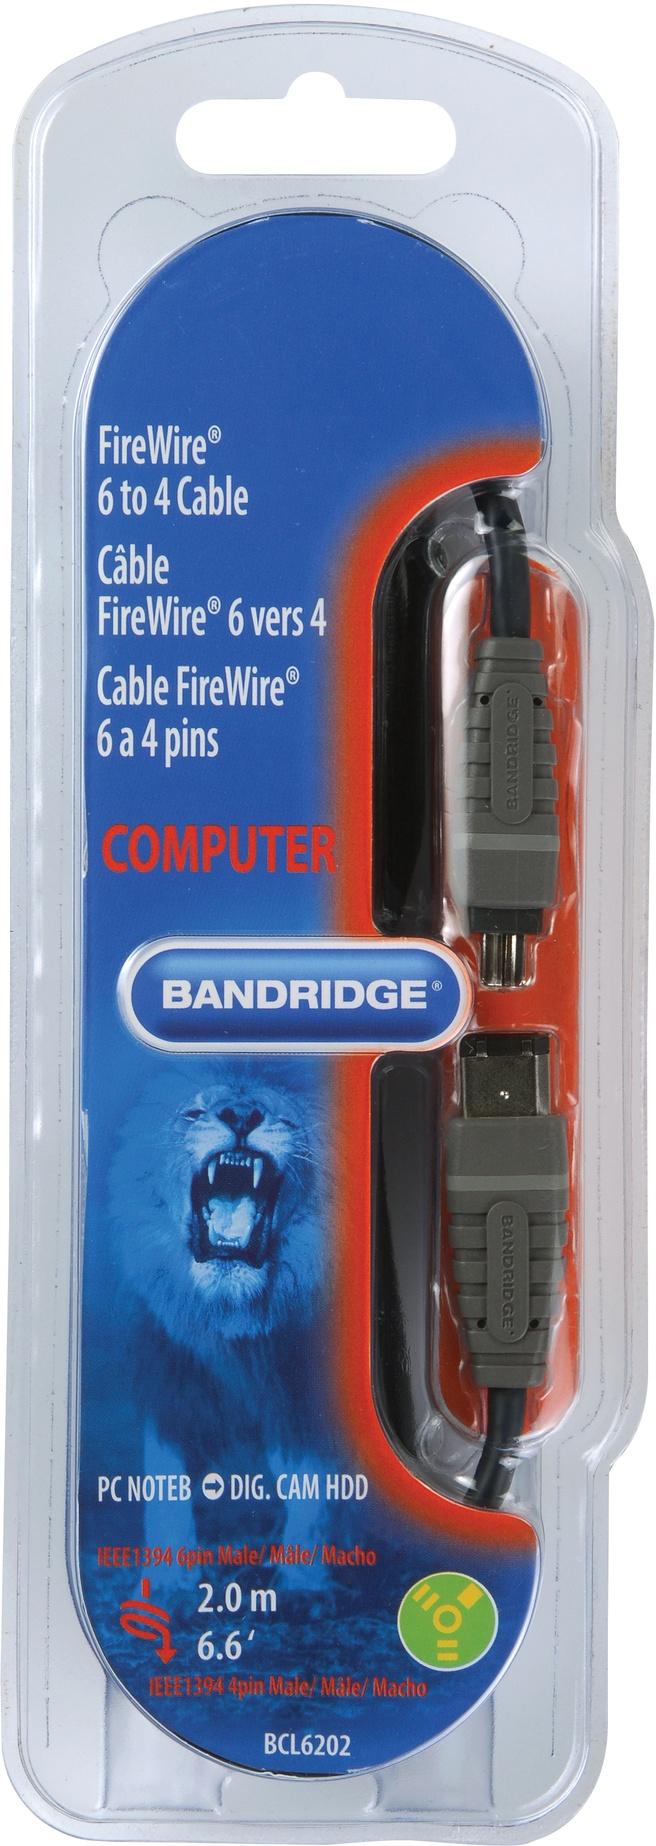 Bandridge 2m FireWire 400 Cable